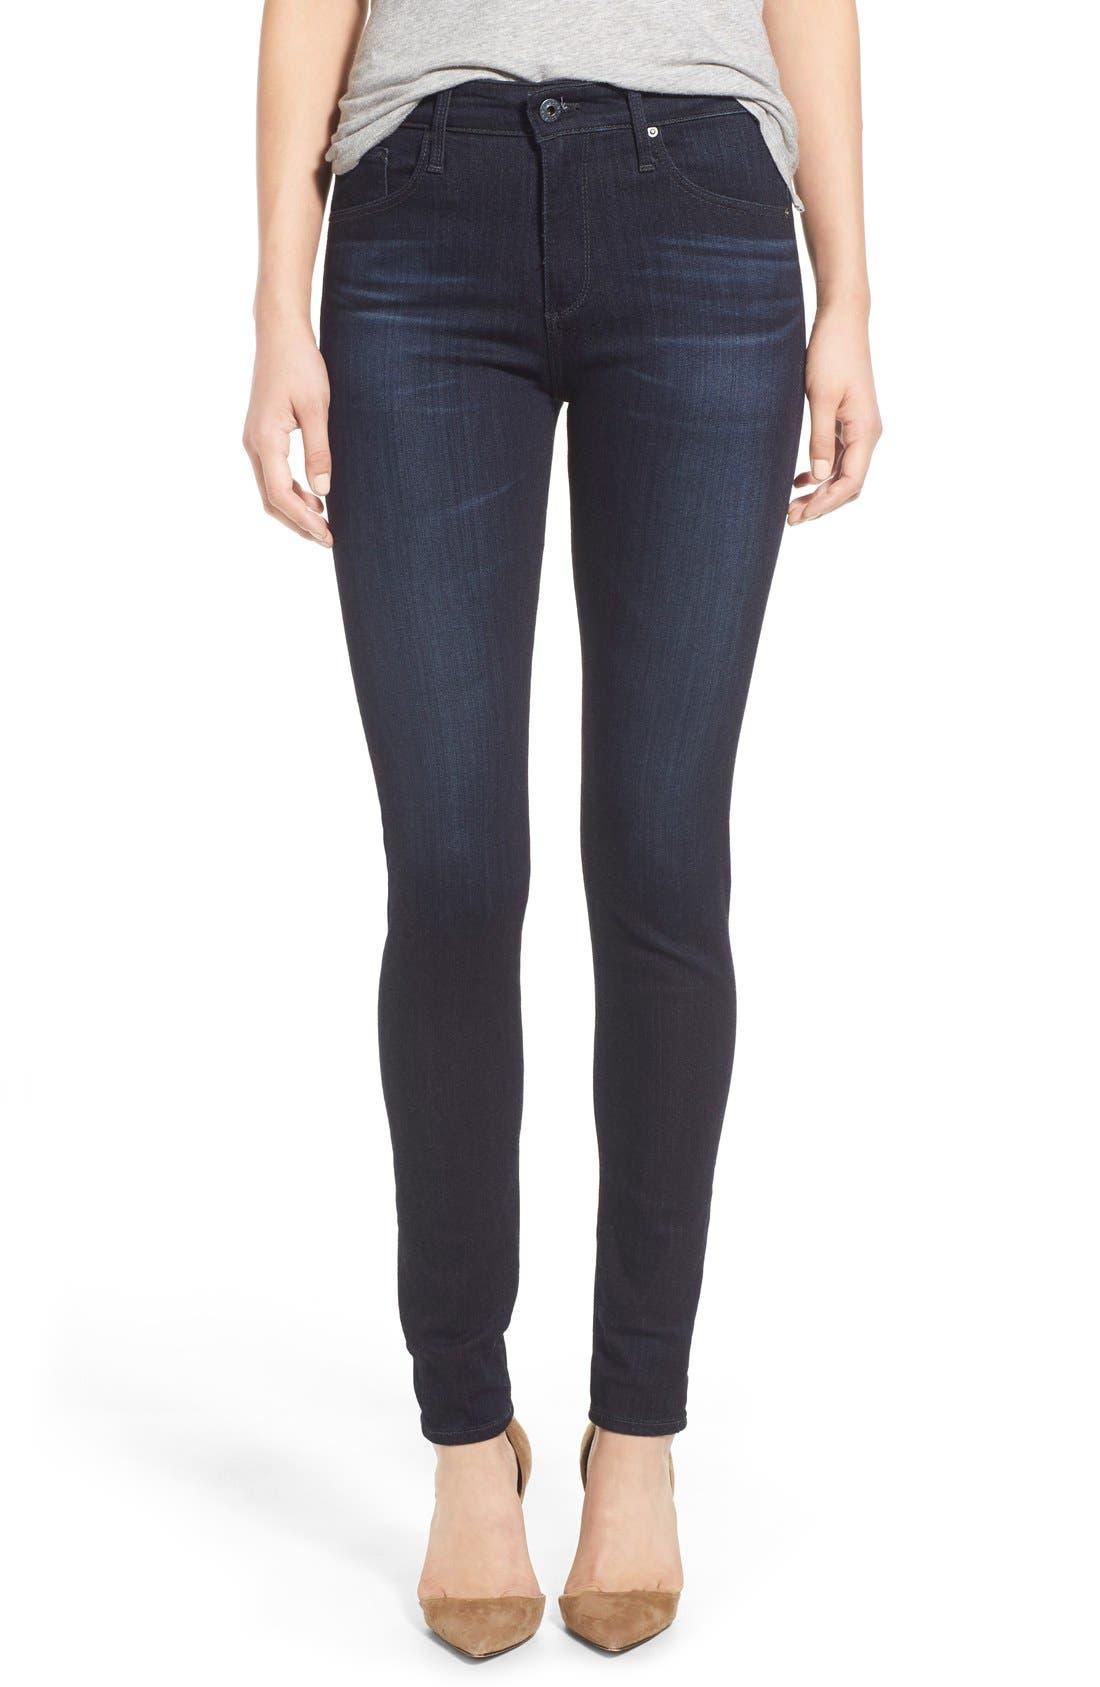 Alternate Image 1 Selected - AG The Farrah High Waist Skinny Jeans (Brooks)